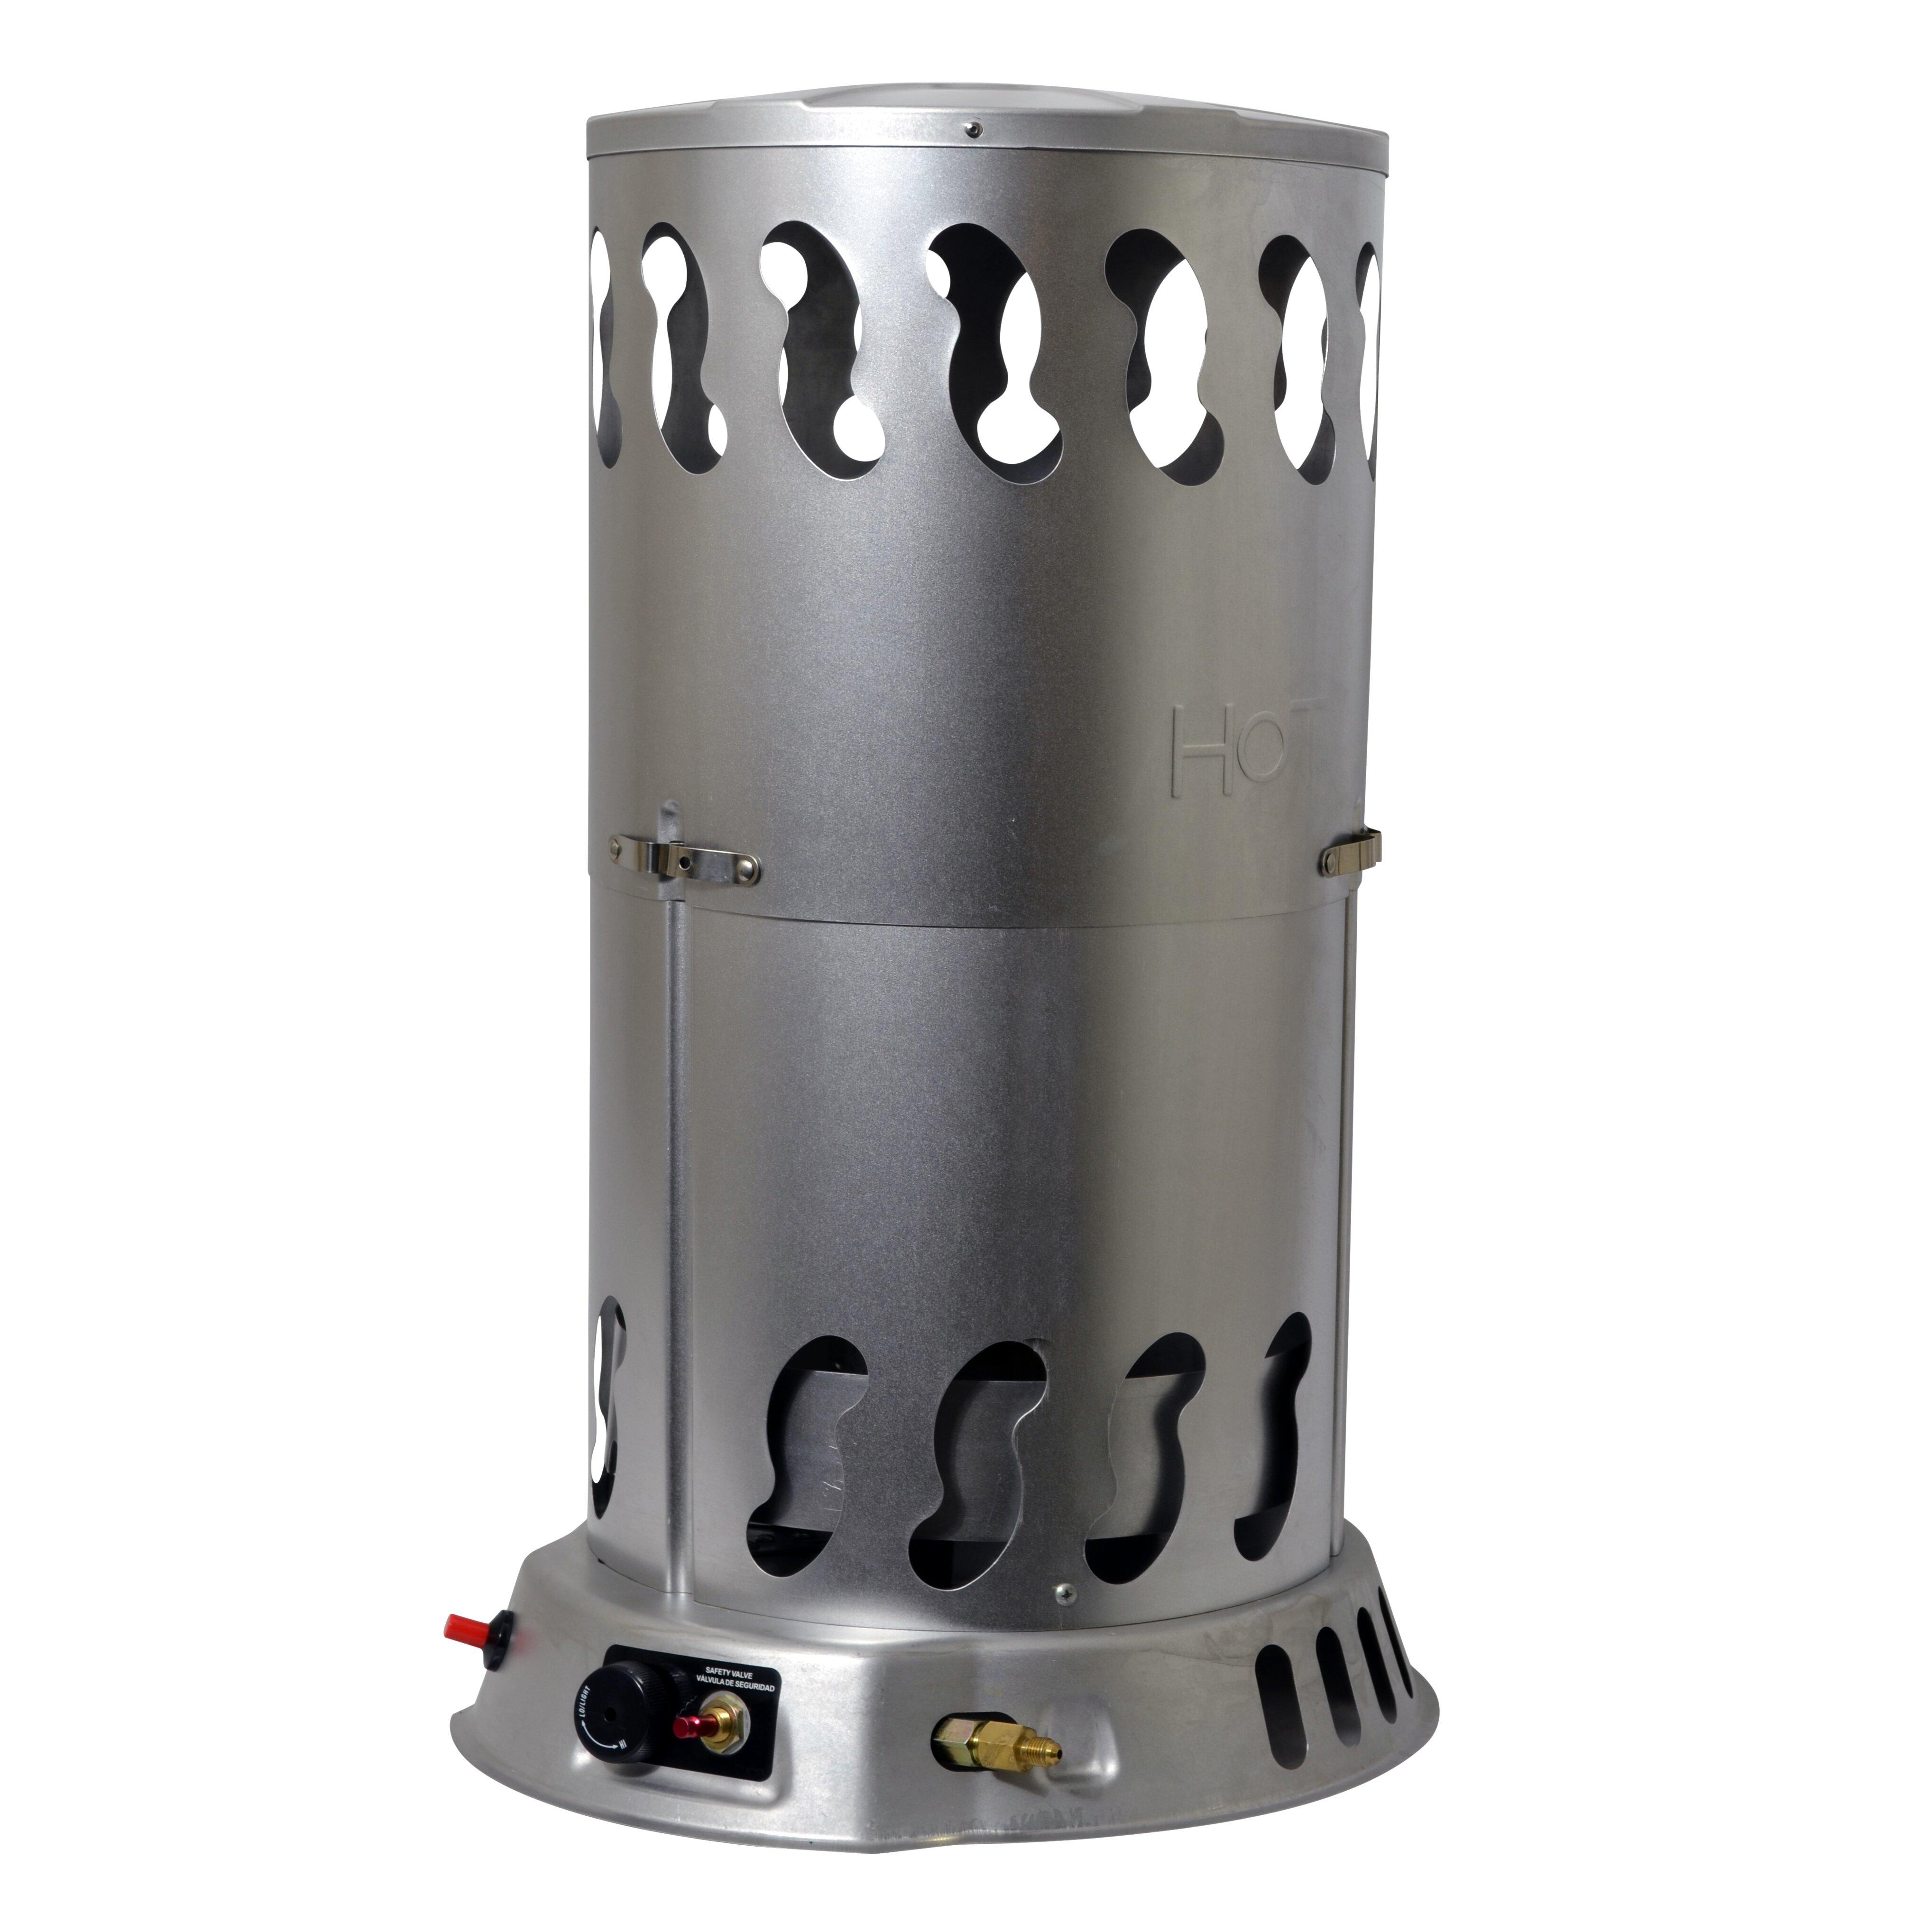 Mr heater 200 000 btu portable propane convection heater wayfair - Small propane space heater collection ...